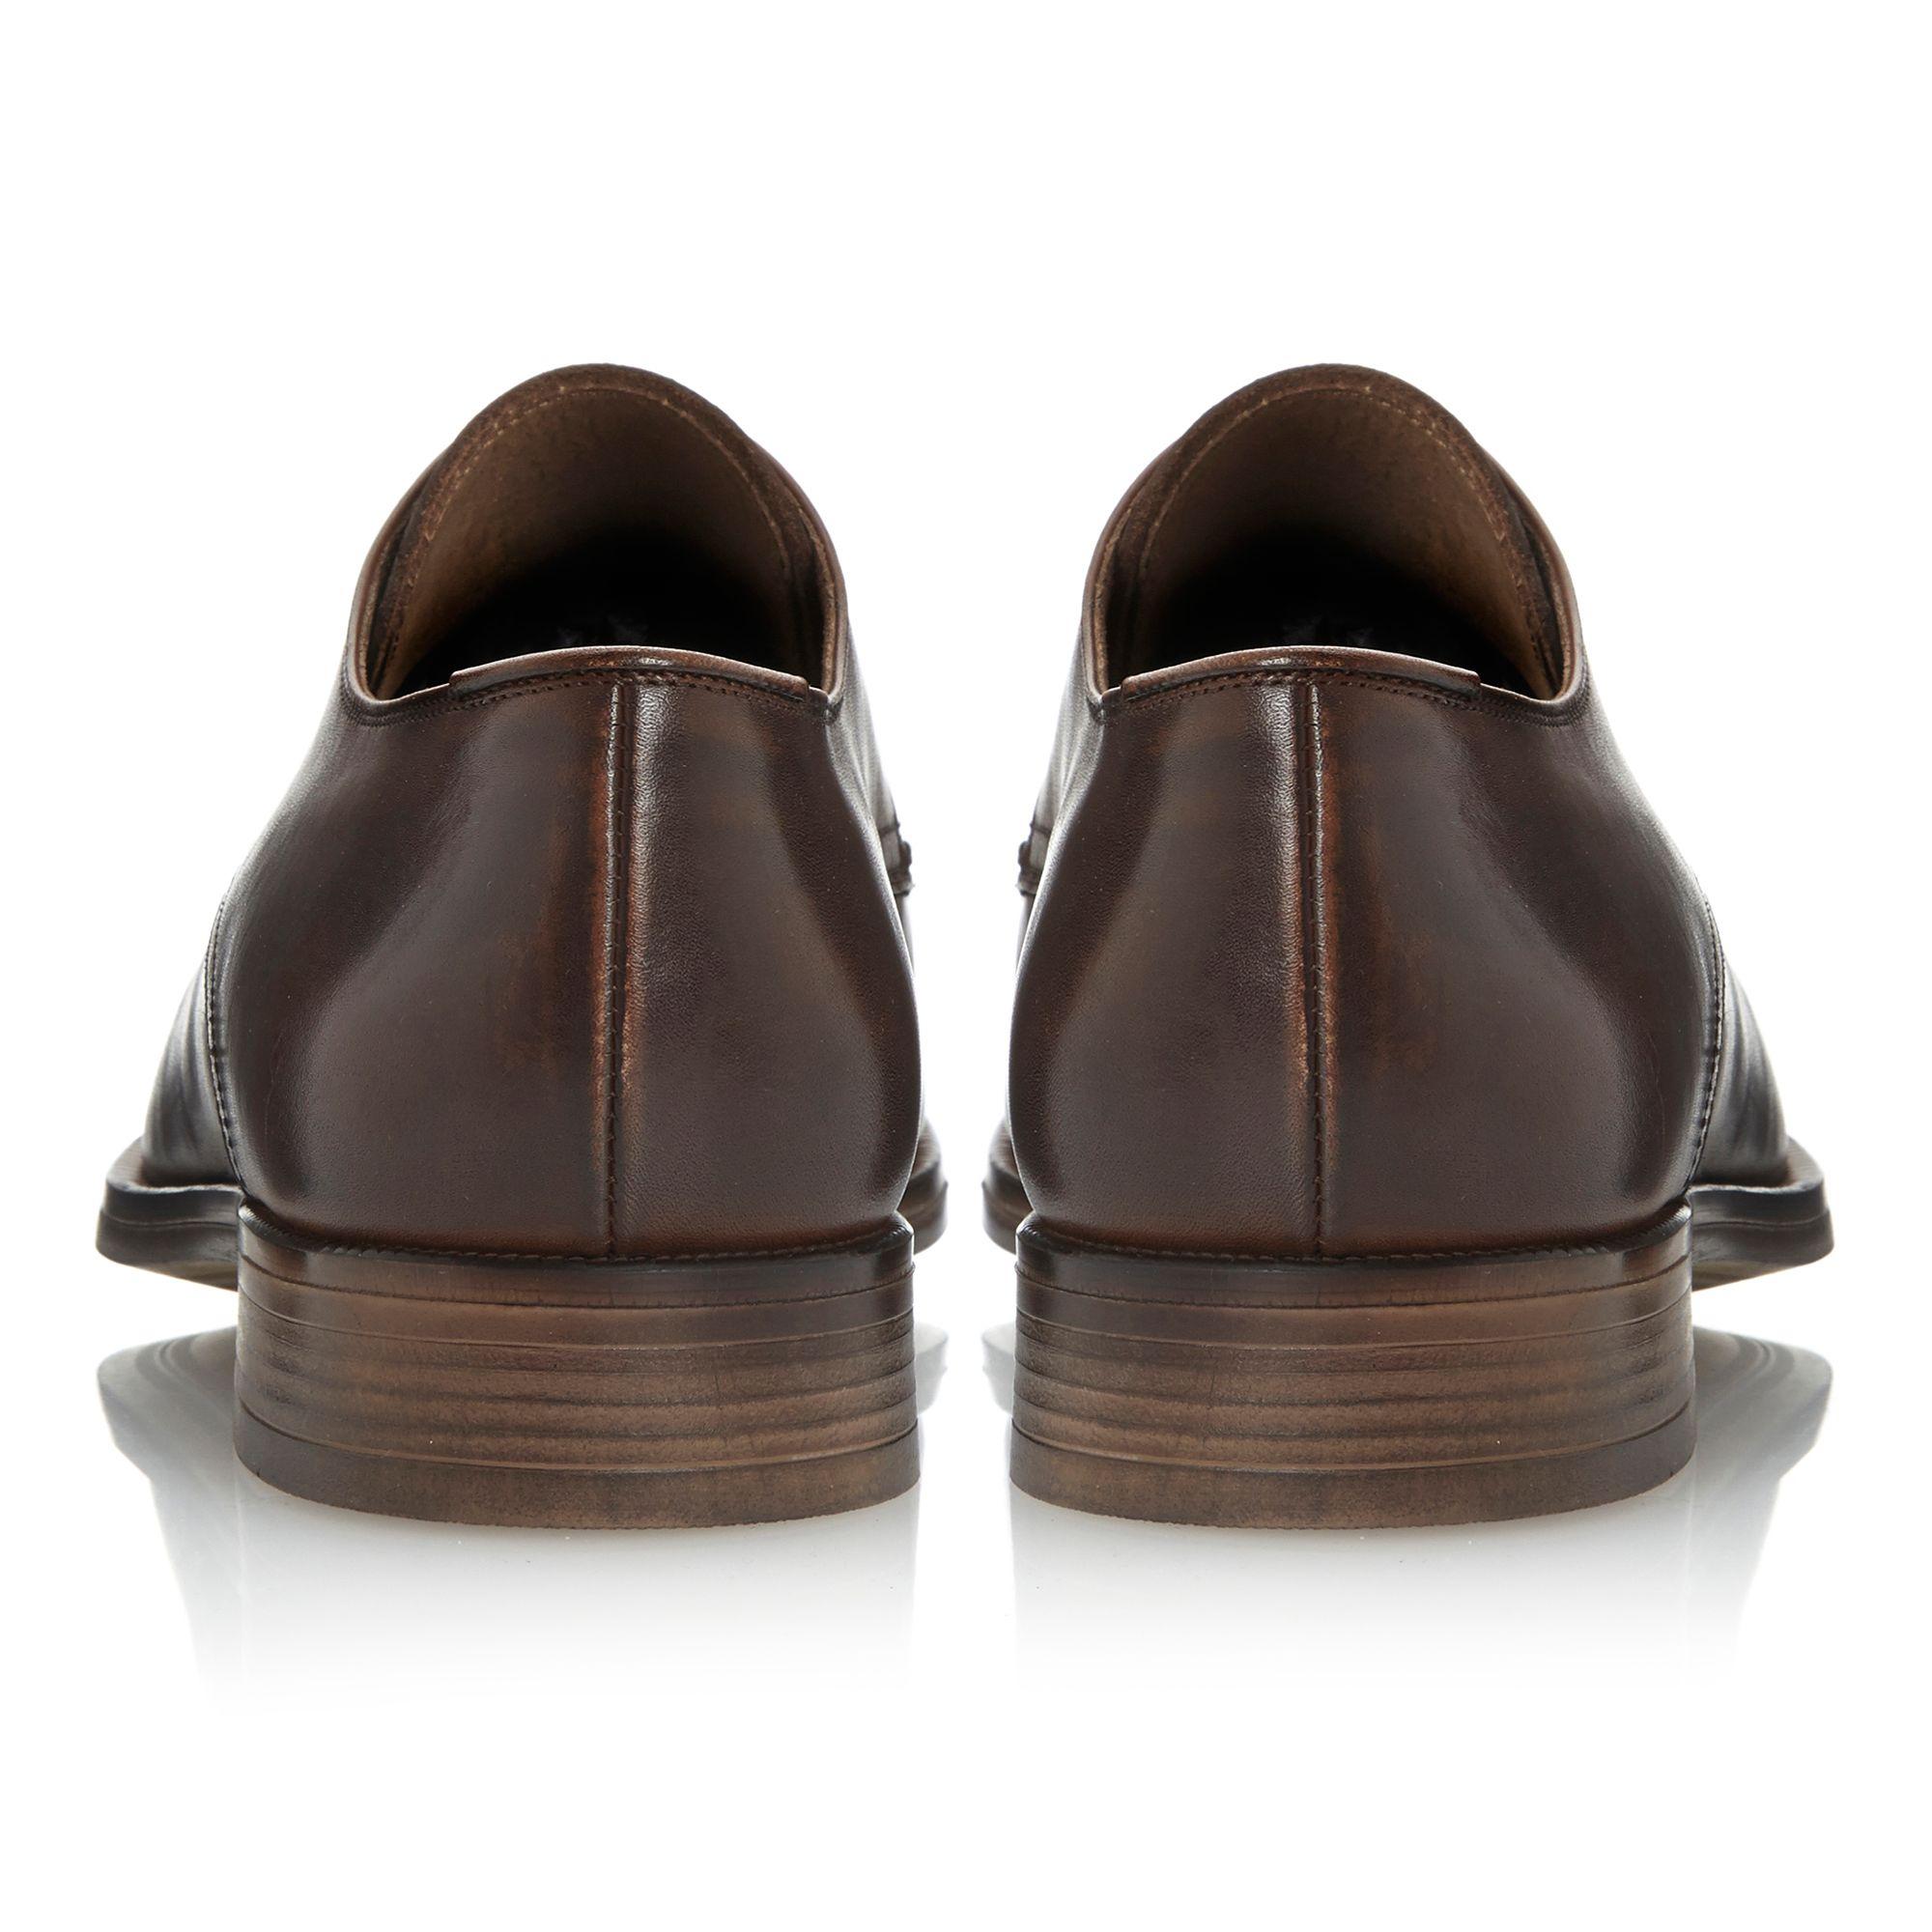 Roland Cartier Leather Cornhill Heavy Toecap Casual in Tan (Brown) for Men